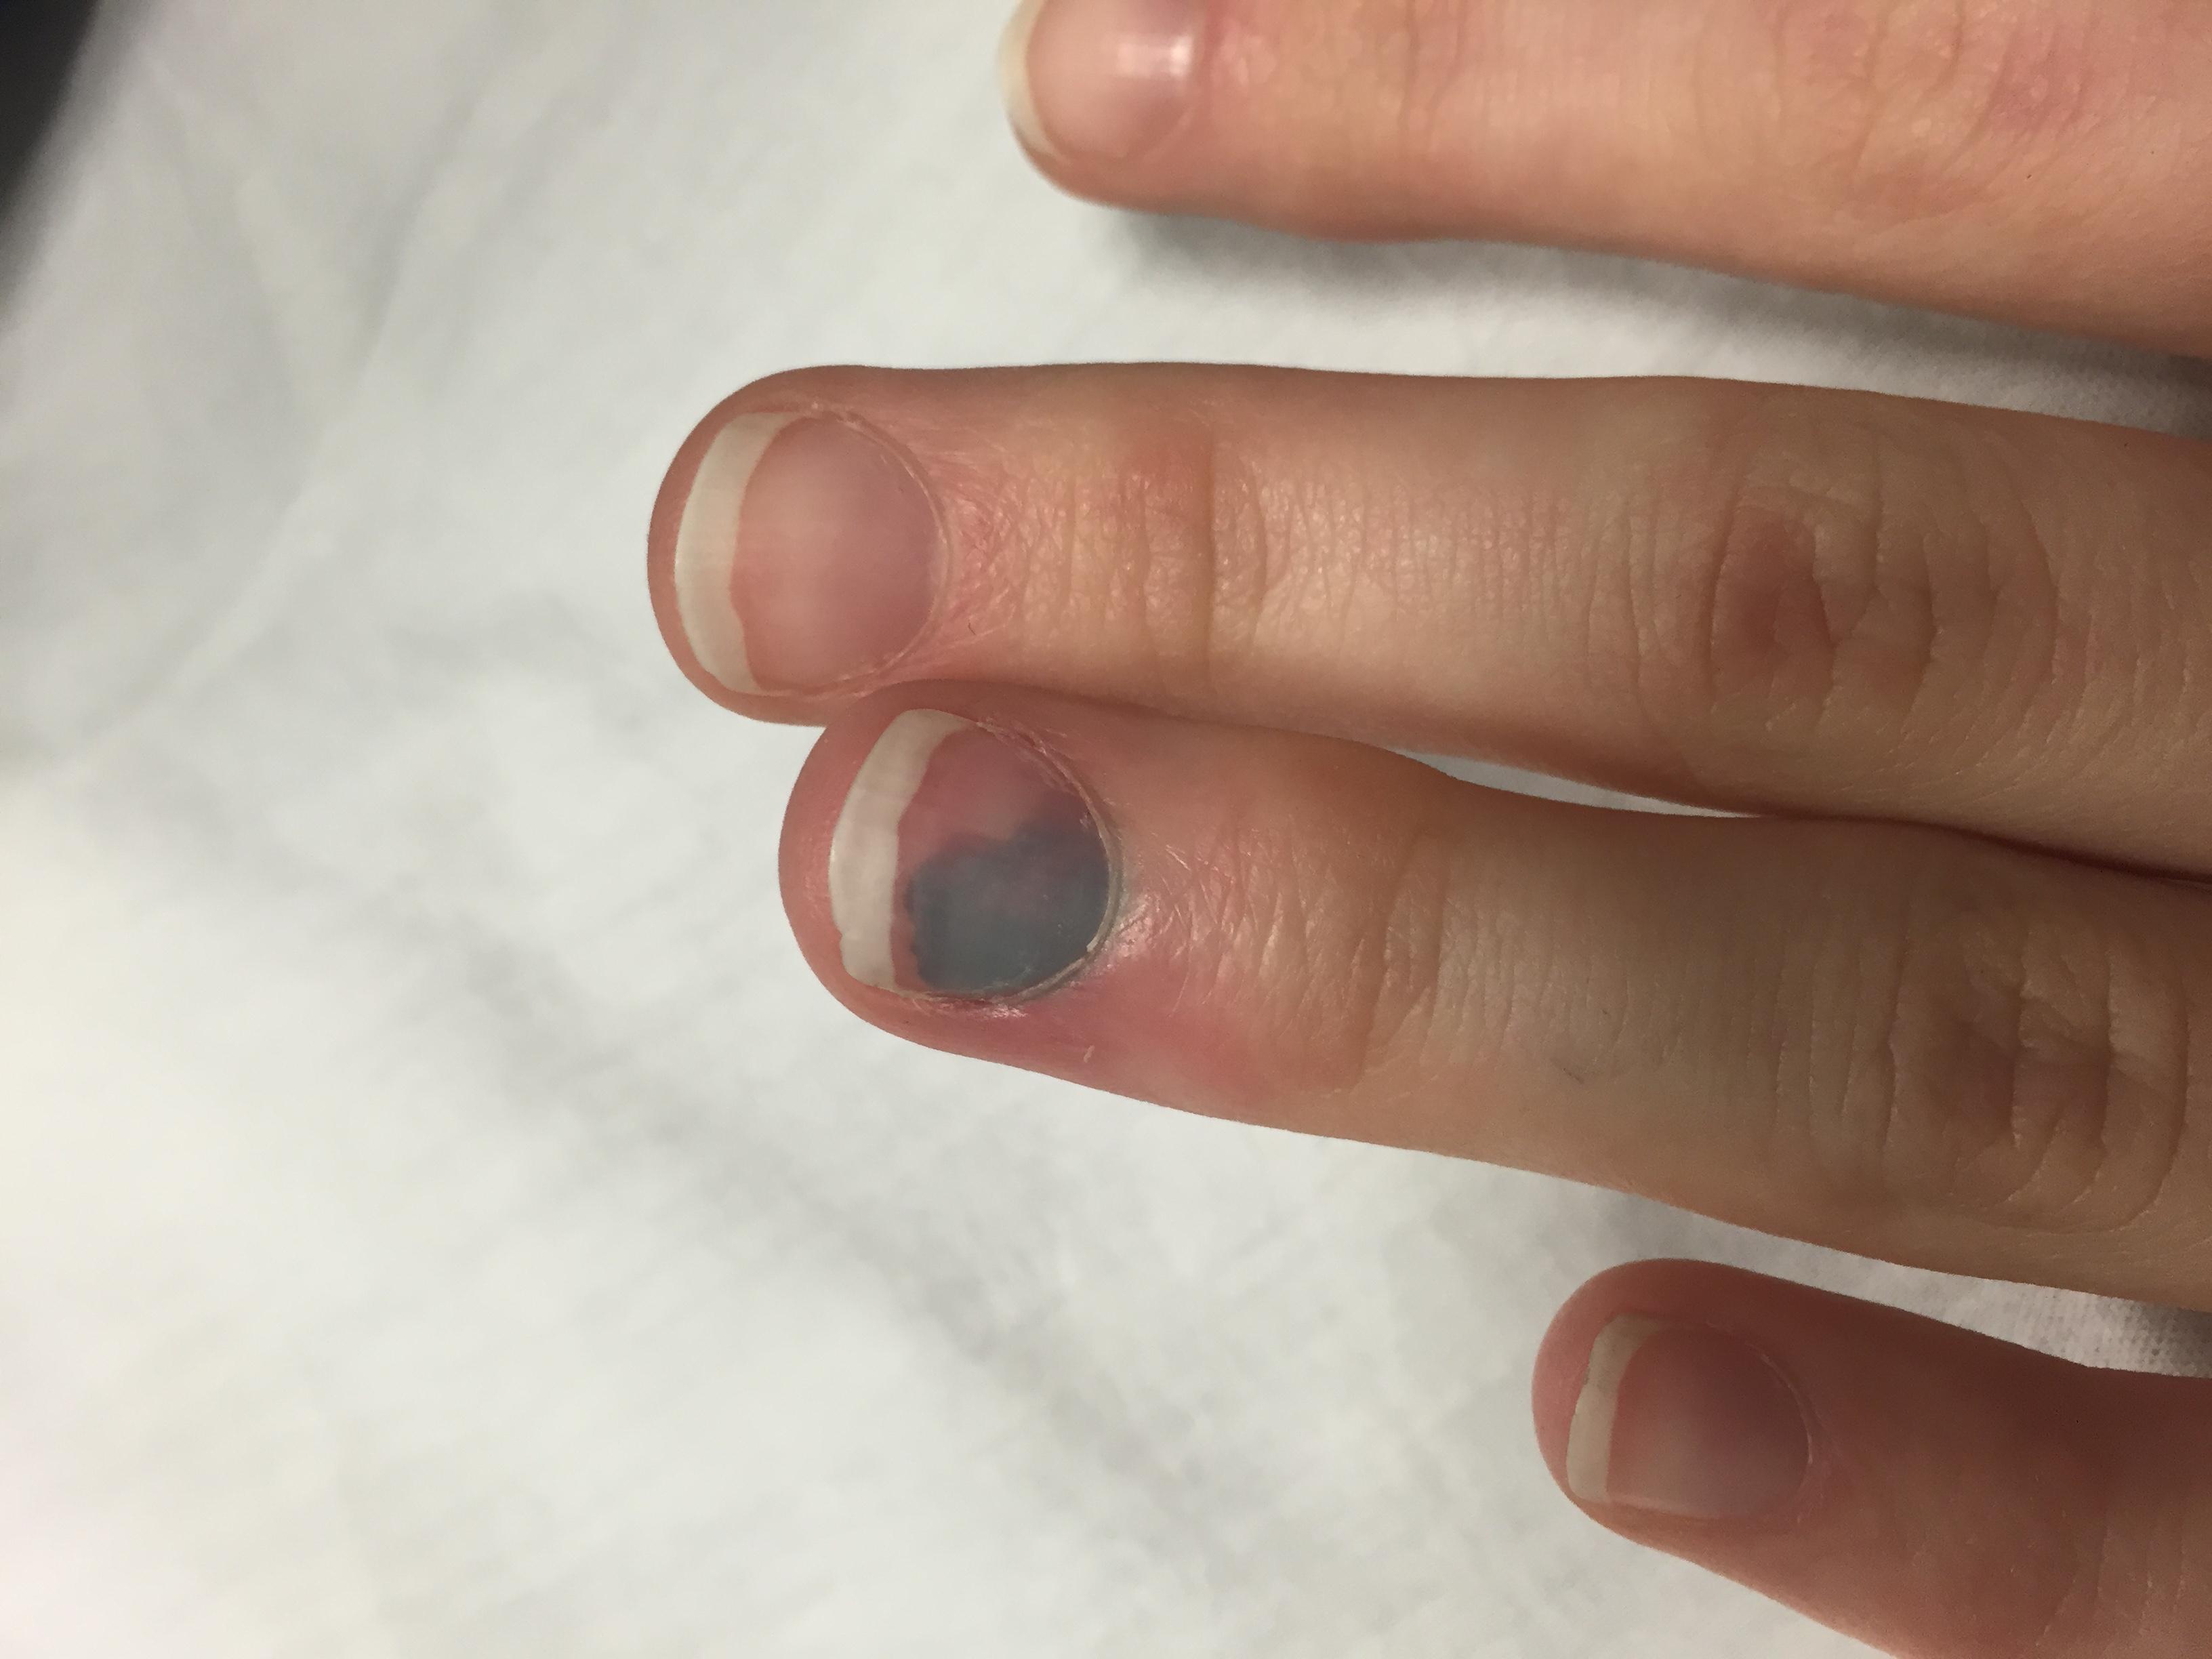 Fingernagel warze entfernen unterm Hausmittel gegen